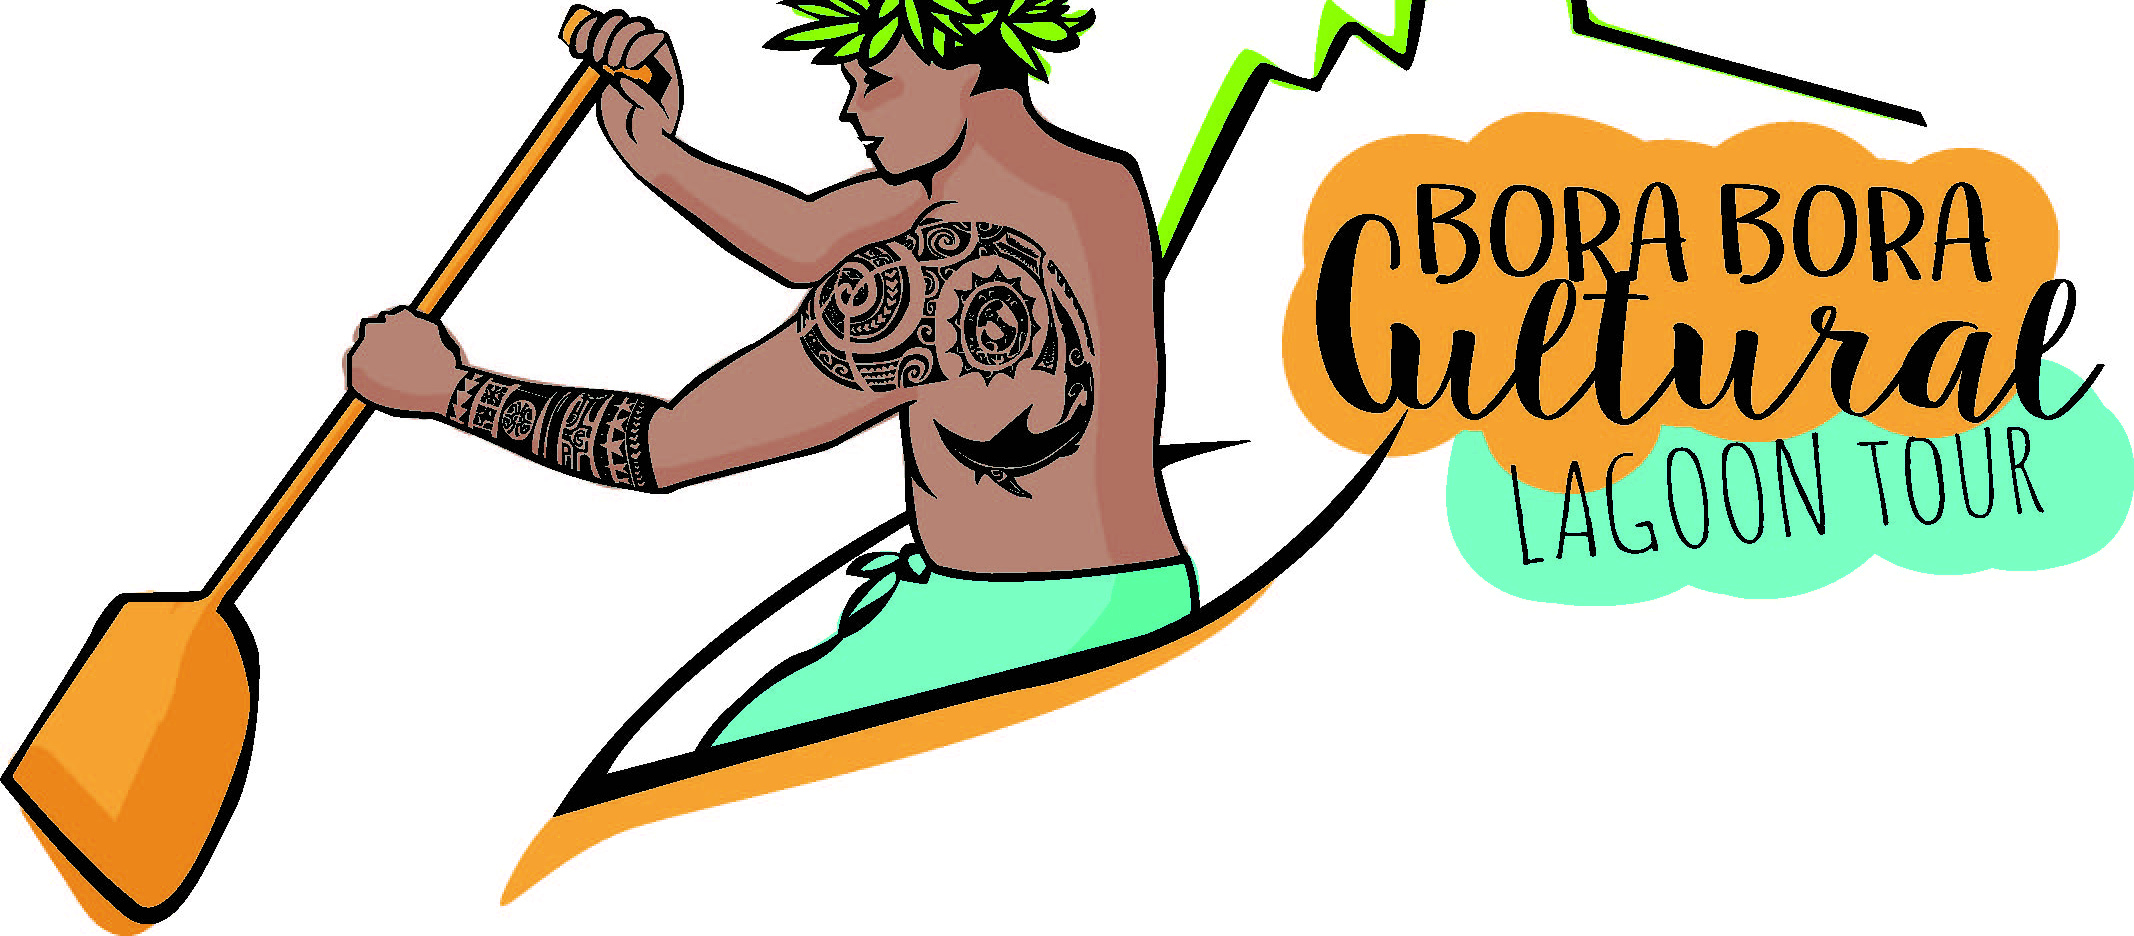 https://tahititourisme.com.au/wp-content/uploads/2018/12/Bob-cultural-lagoon-tour.jpg